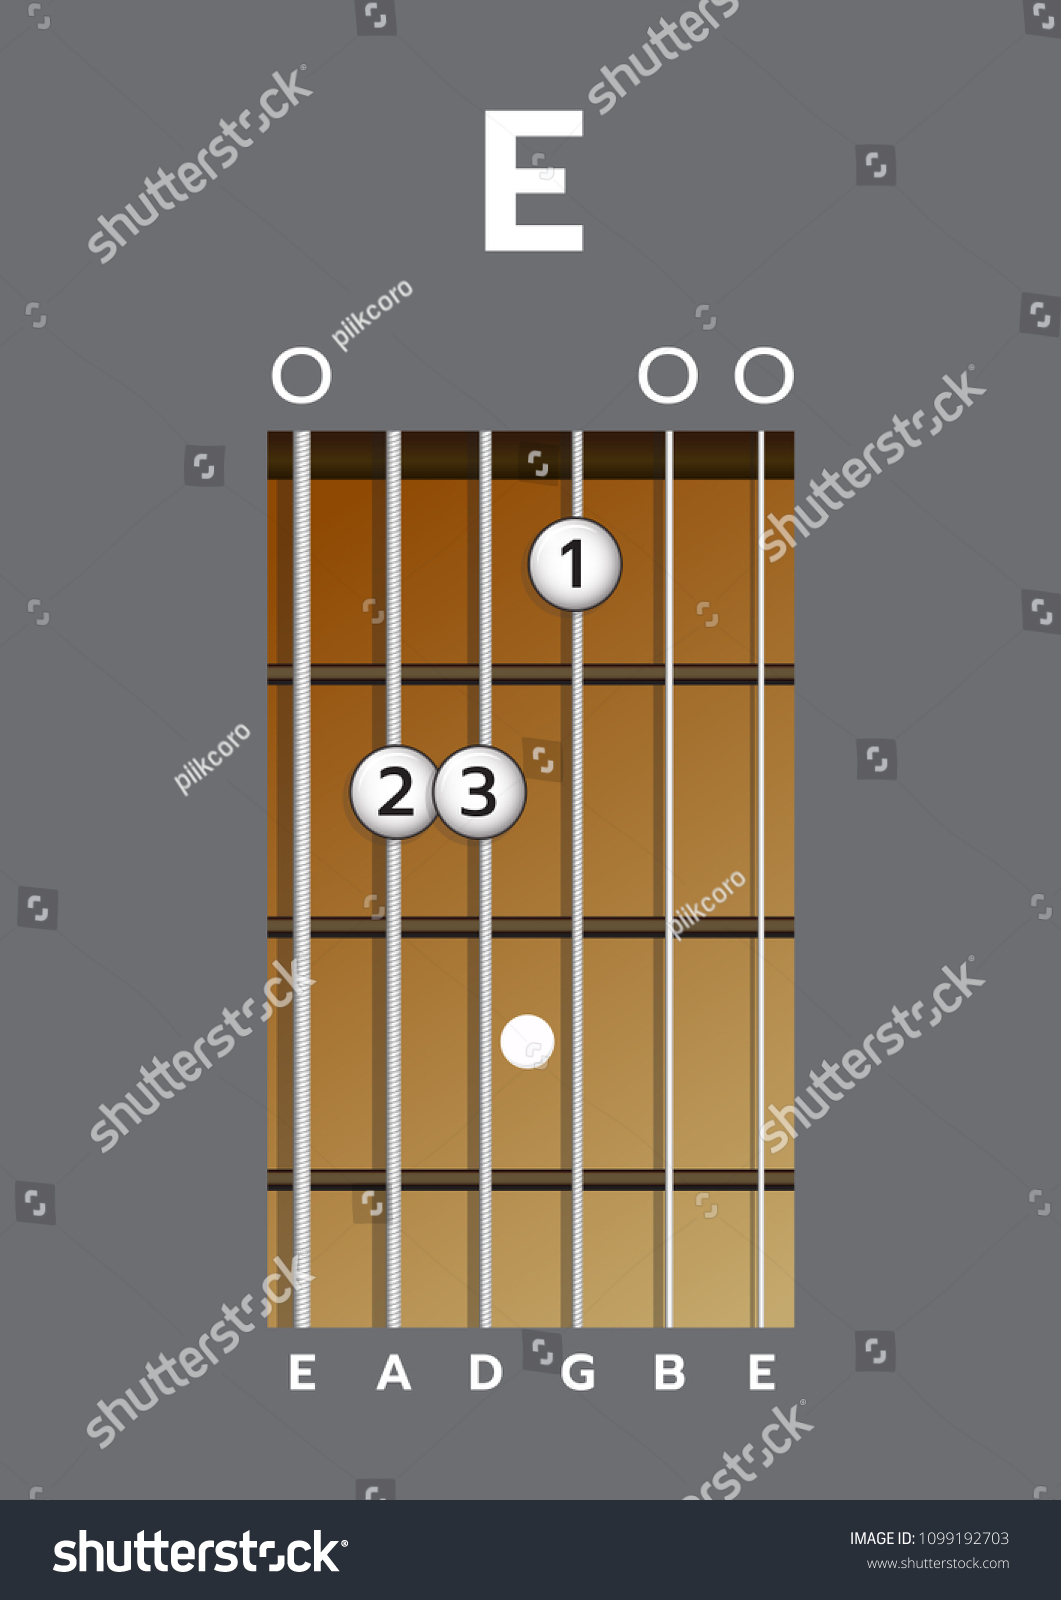 Chord Diagram Tab Tabulation Finger Chart Stock Vector Royalty Free Guitar Chords Fingers Charts Basic E